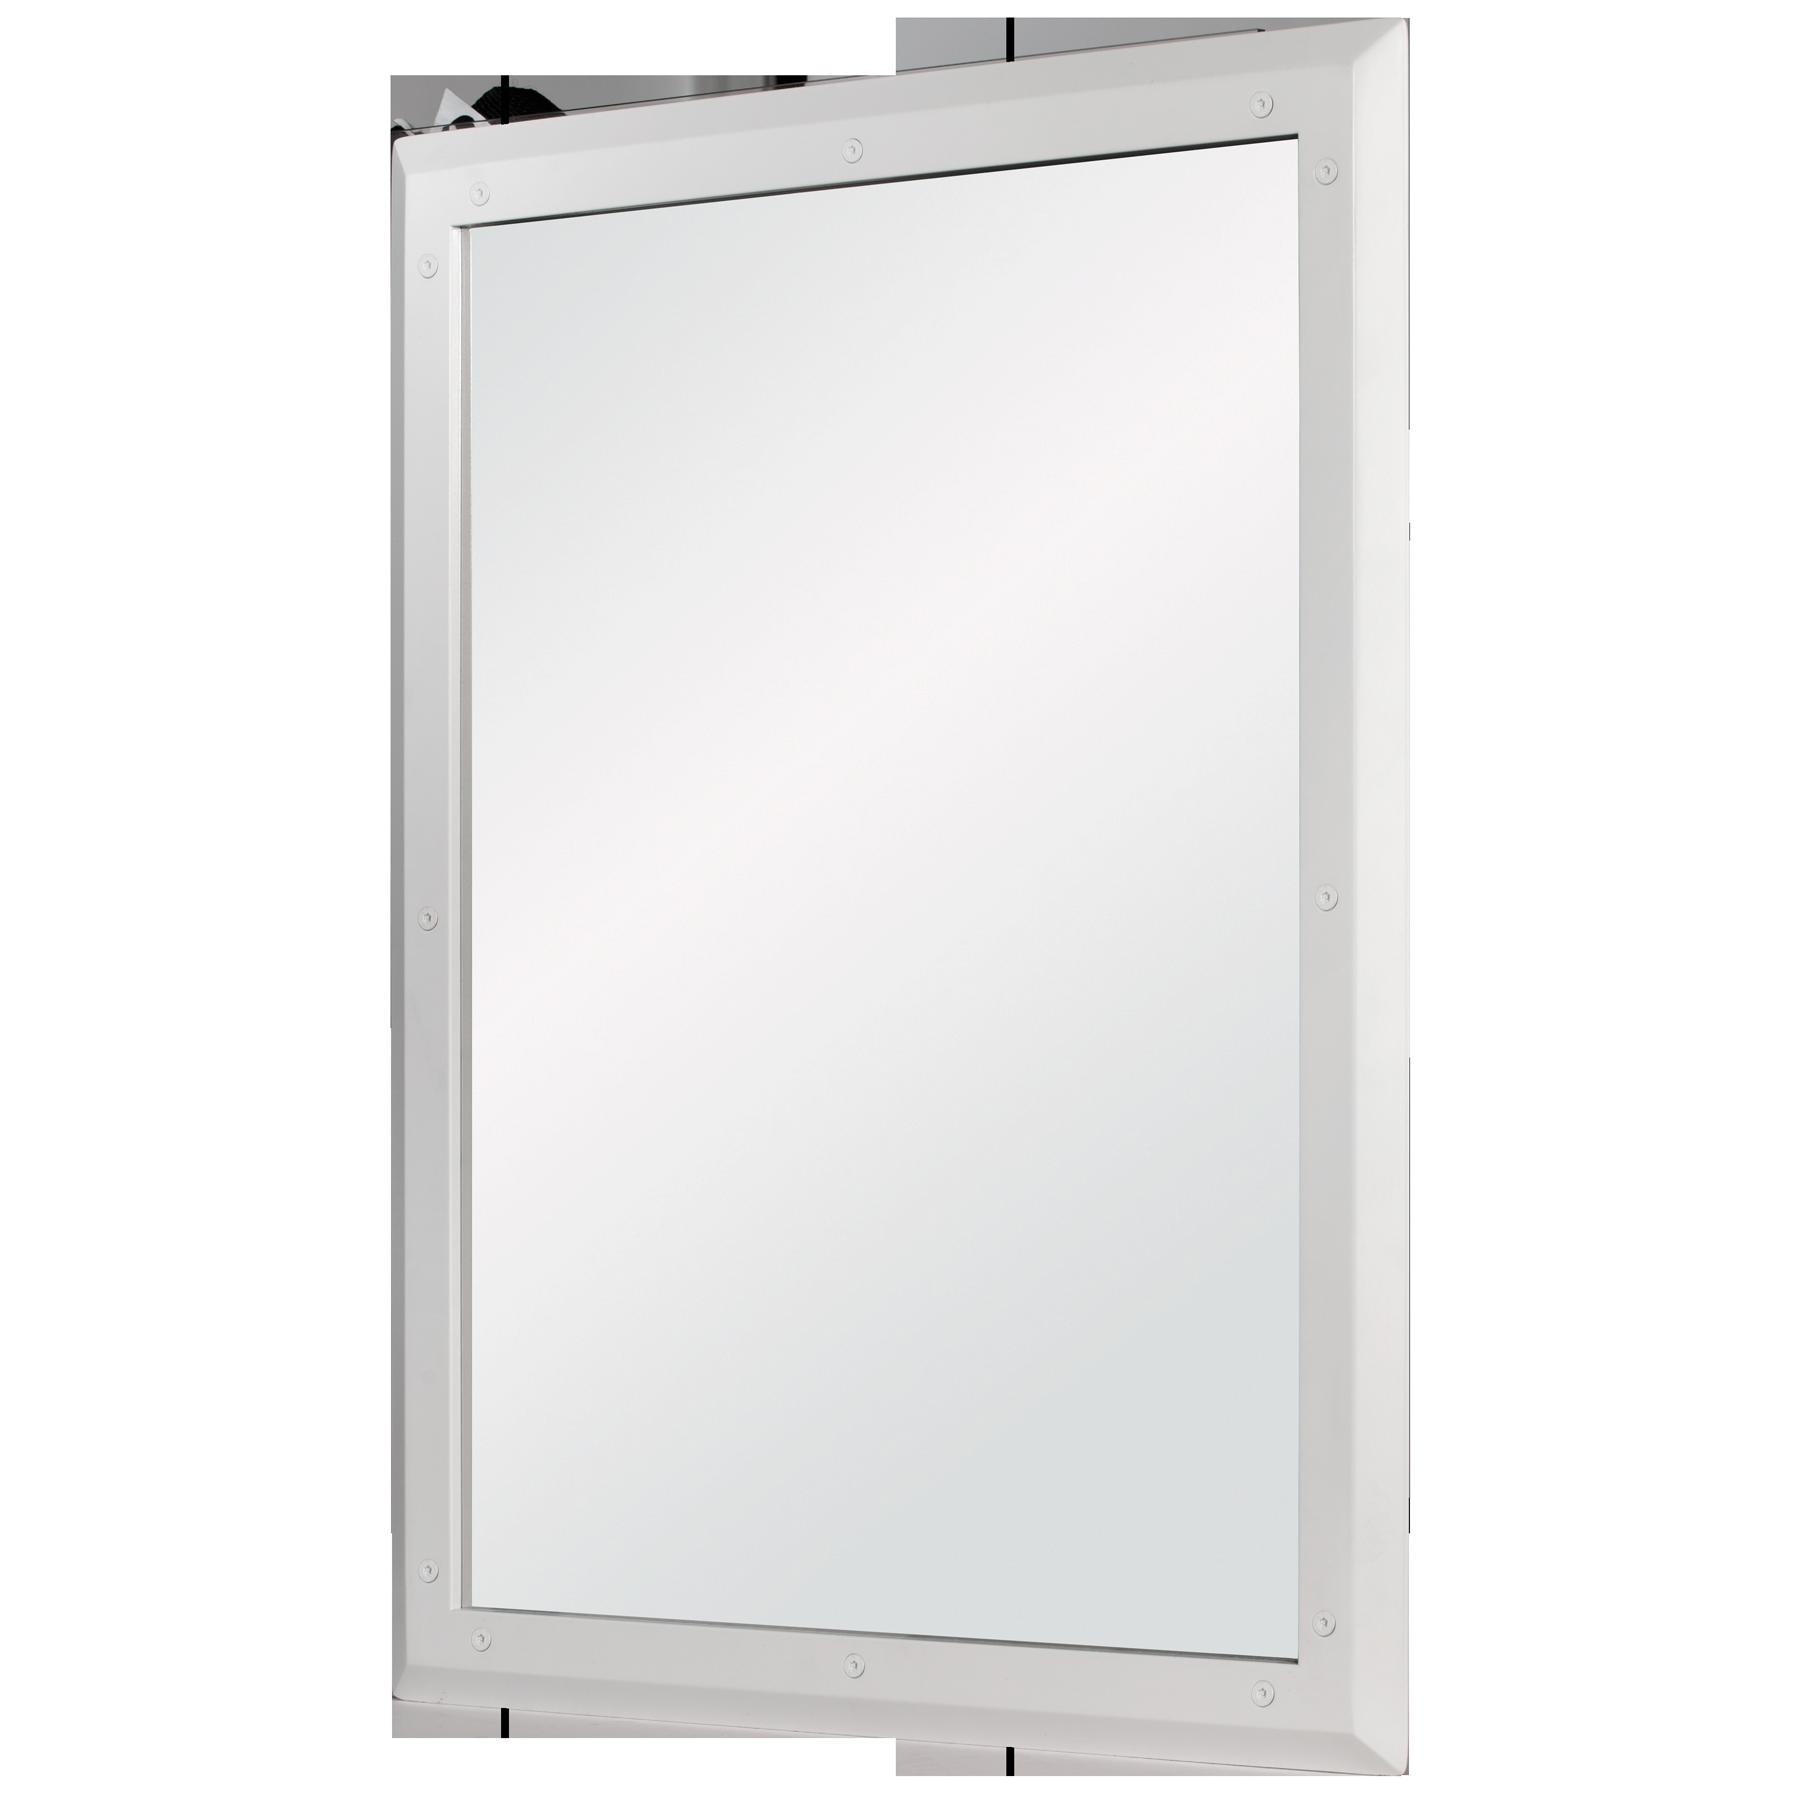 Ligature Resistant Bathroom Mirror